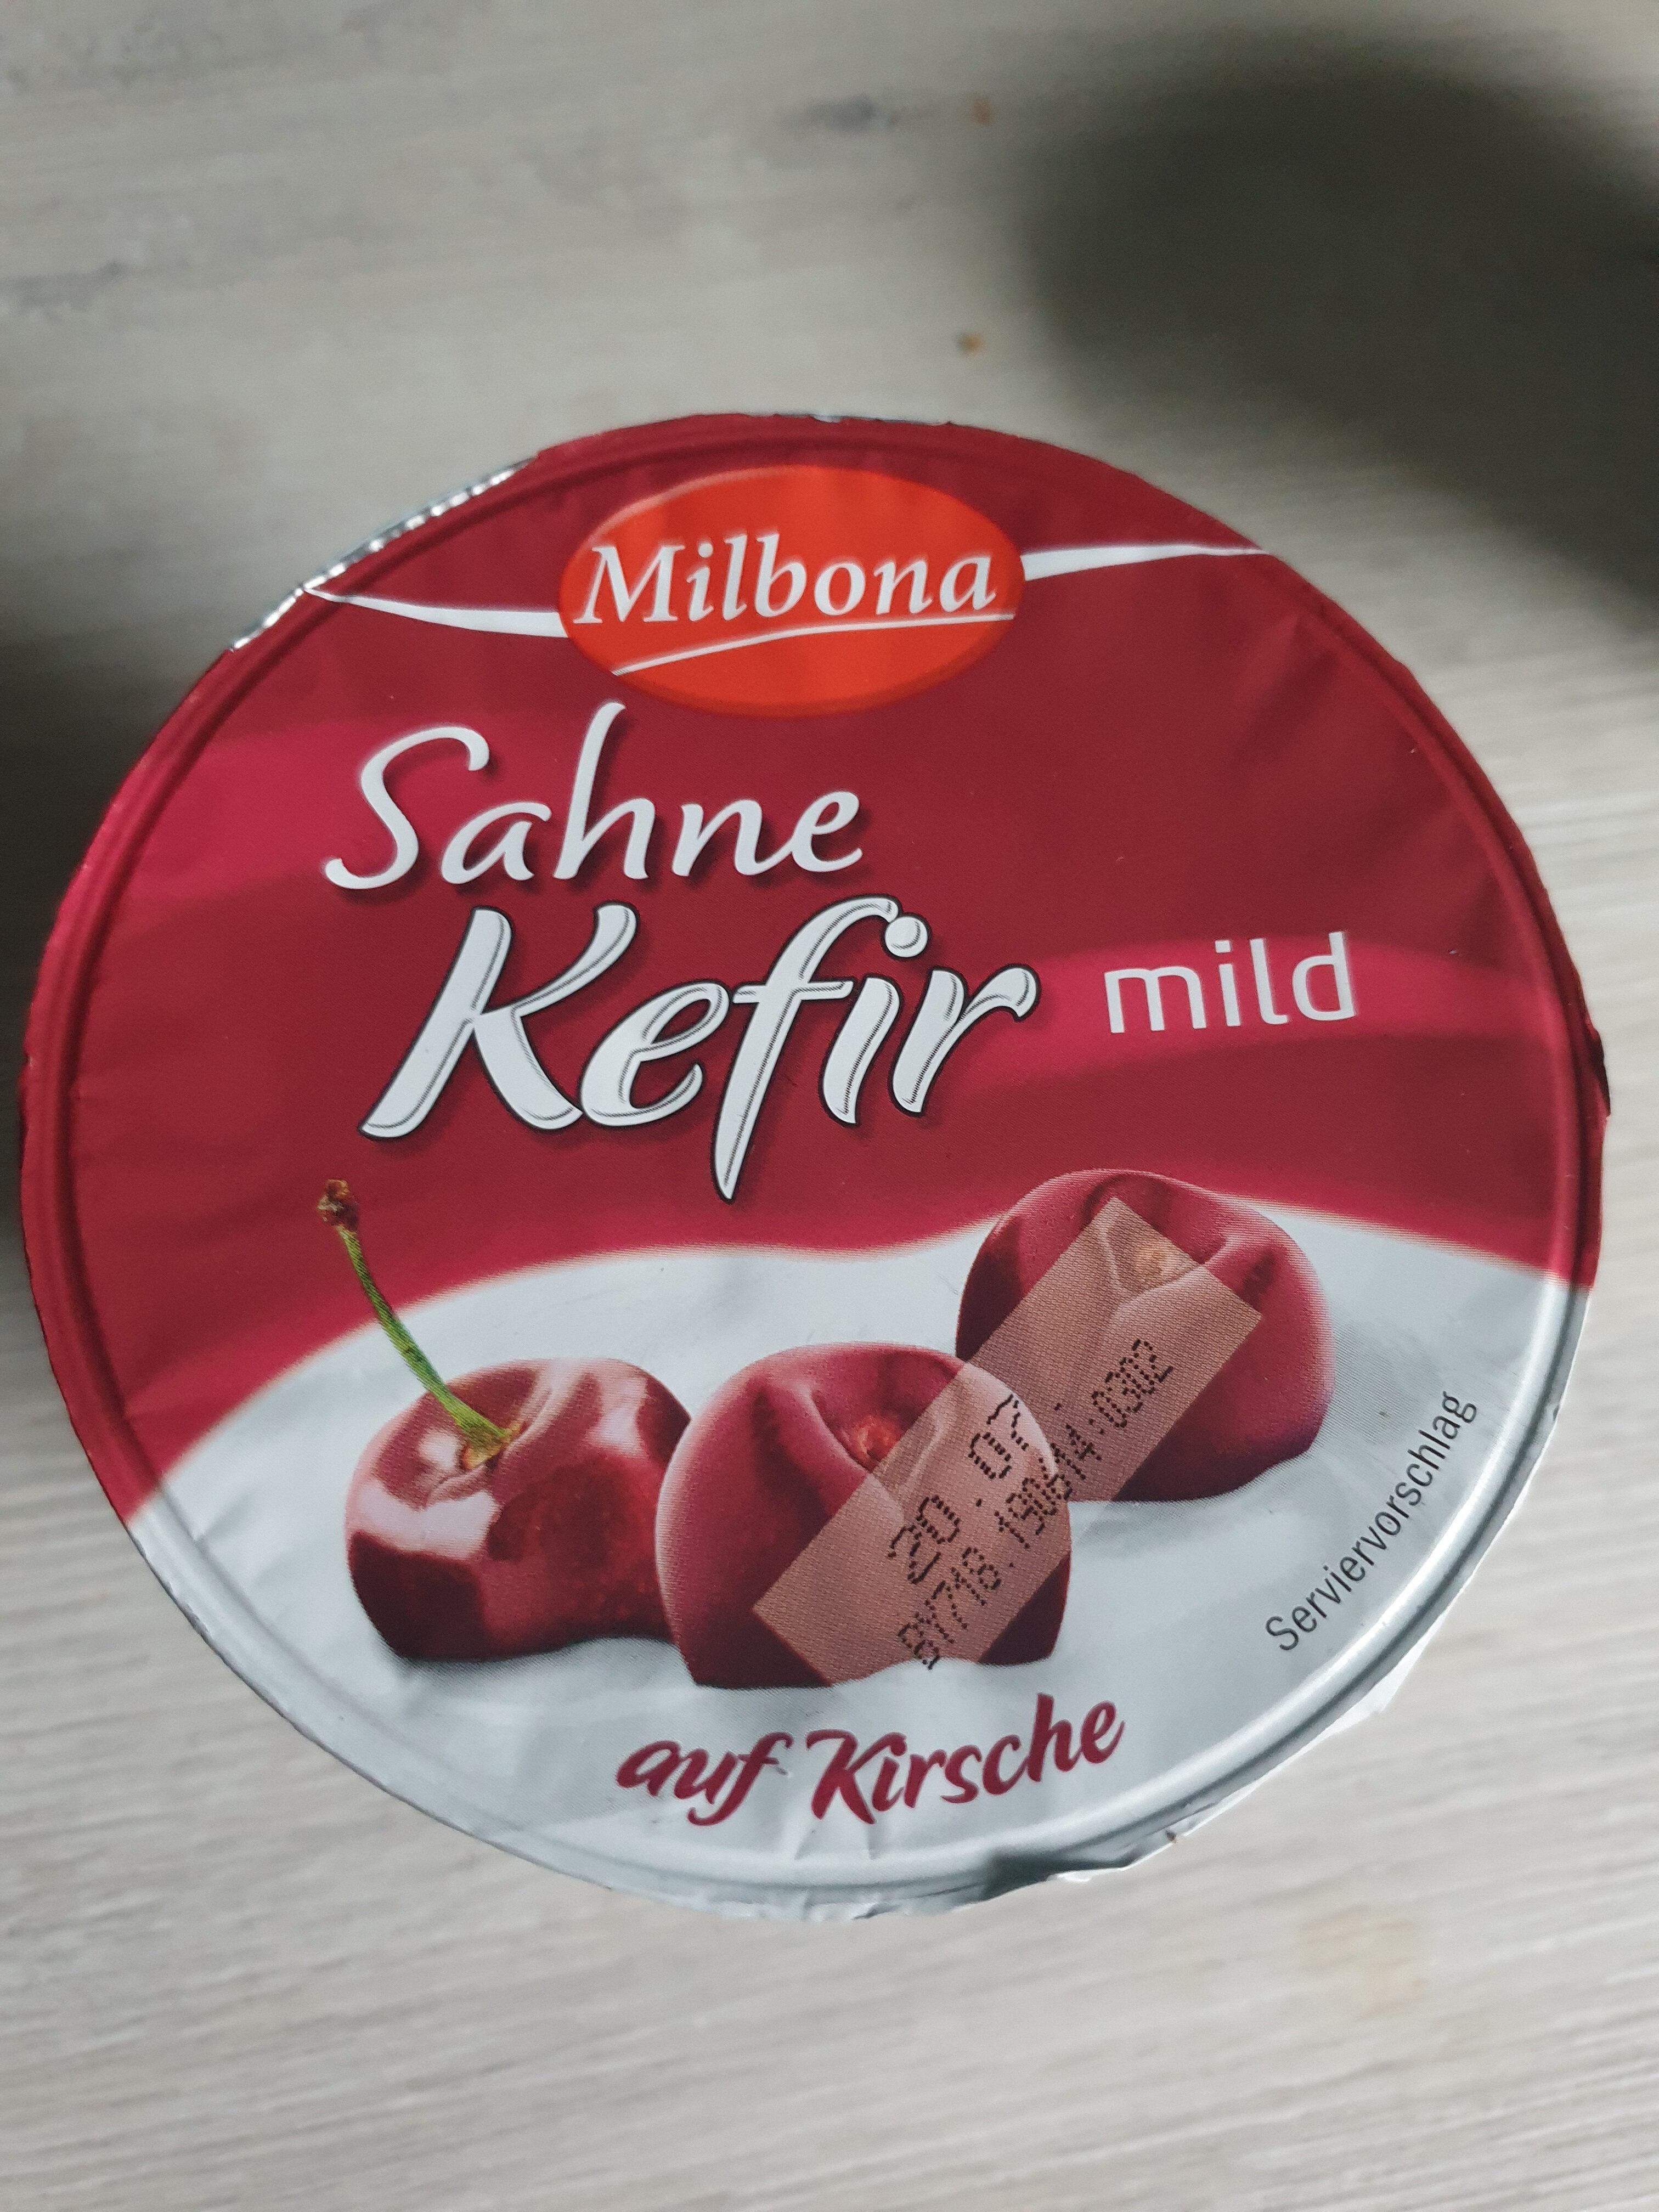 Sahne Kefir mild - Product - de